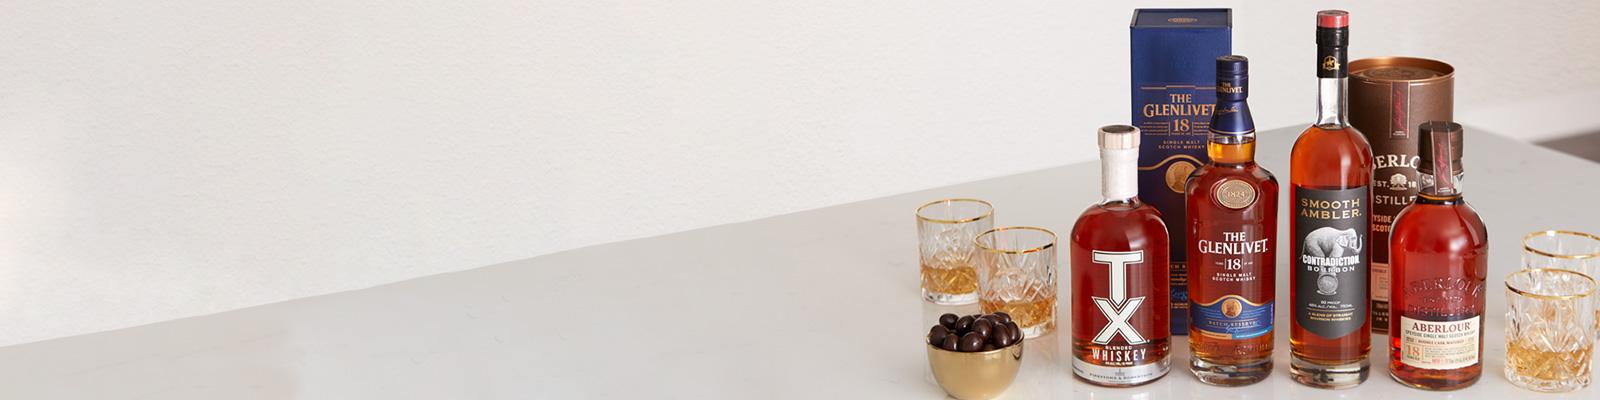 Premium Whisk(e)y Pours